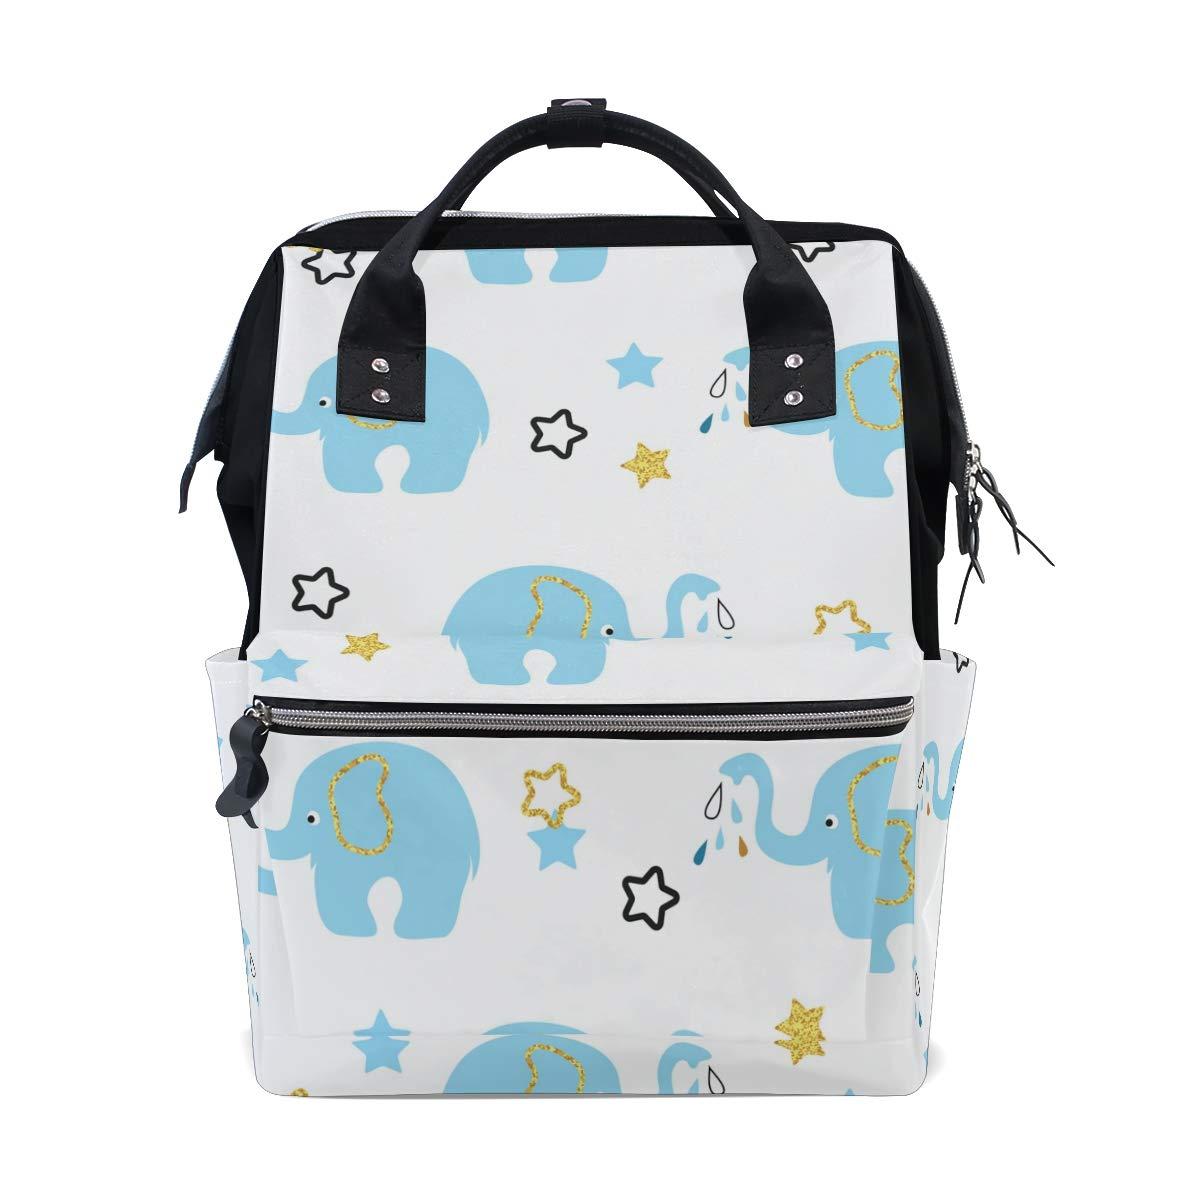 MERRYSUGAR Diaper Bag Mommy Bag School Backpack Baby Bag Baby Elephant Star White Large Multifunction Travel Bag Mommy Bag